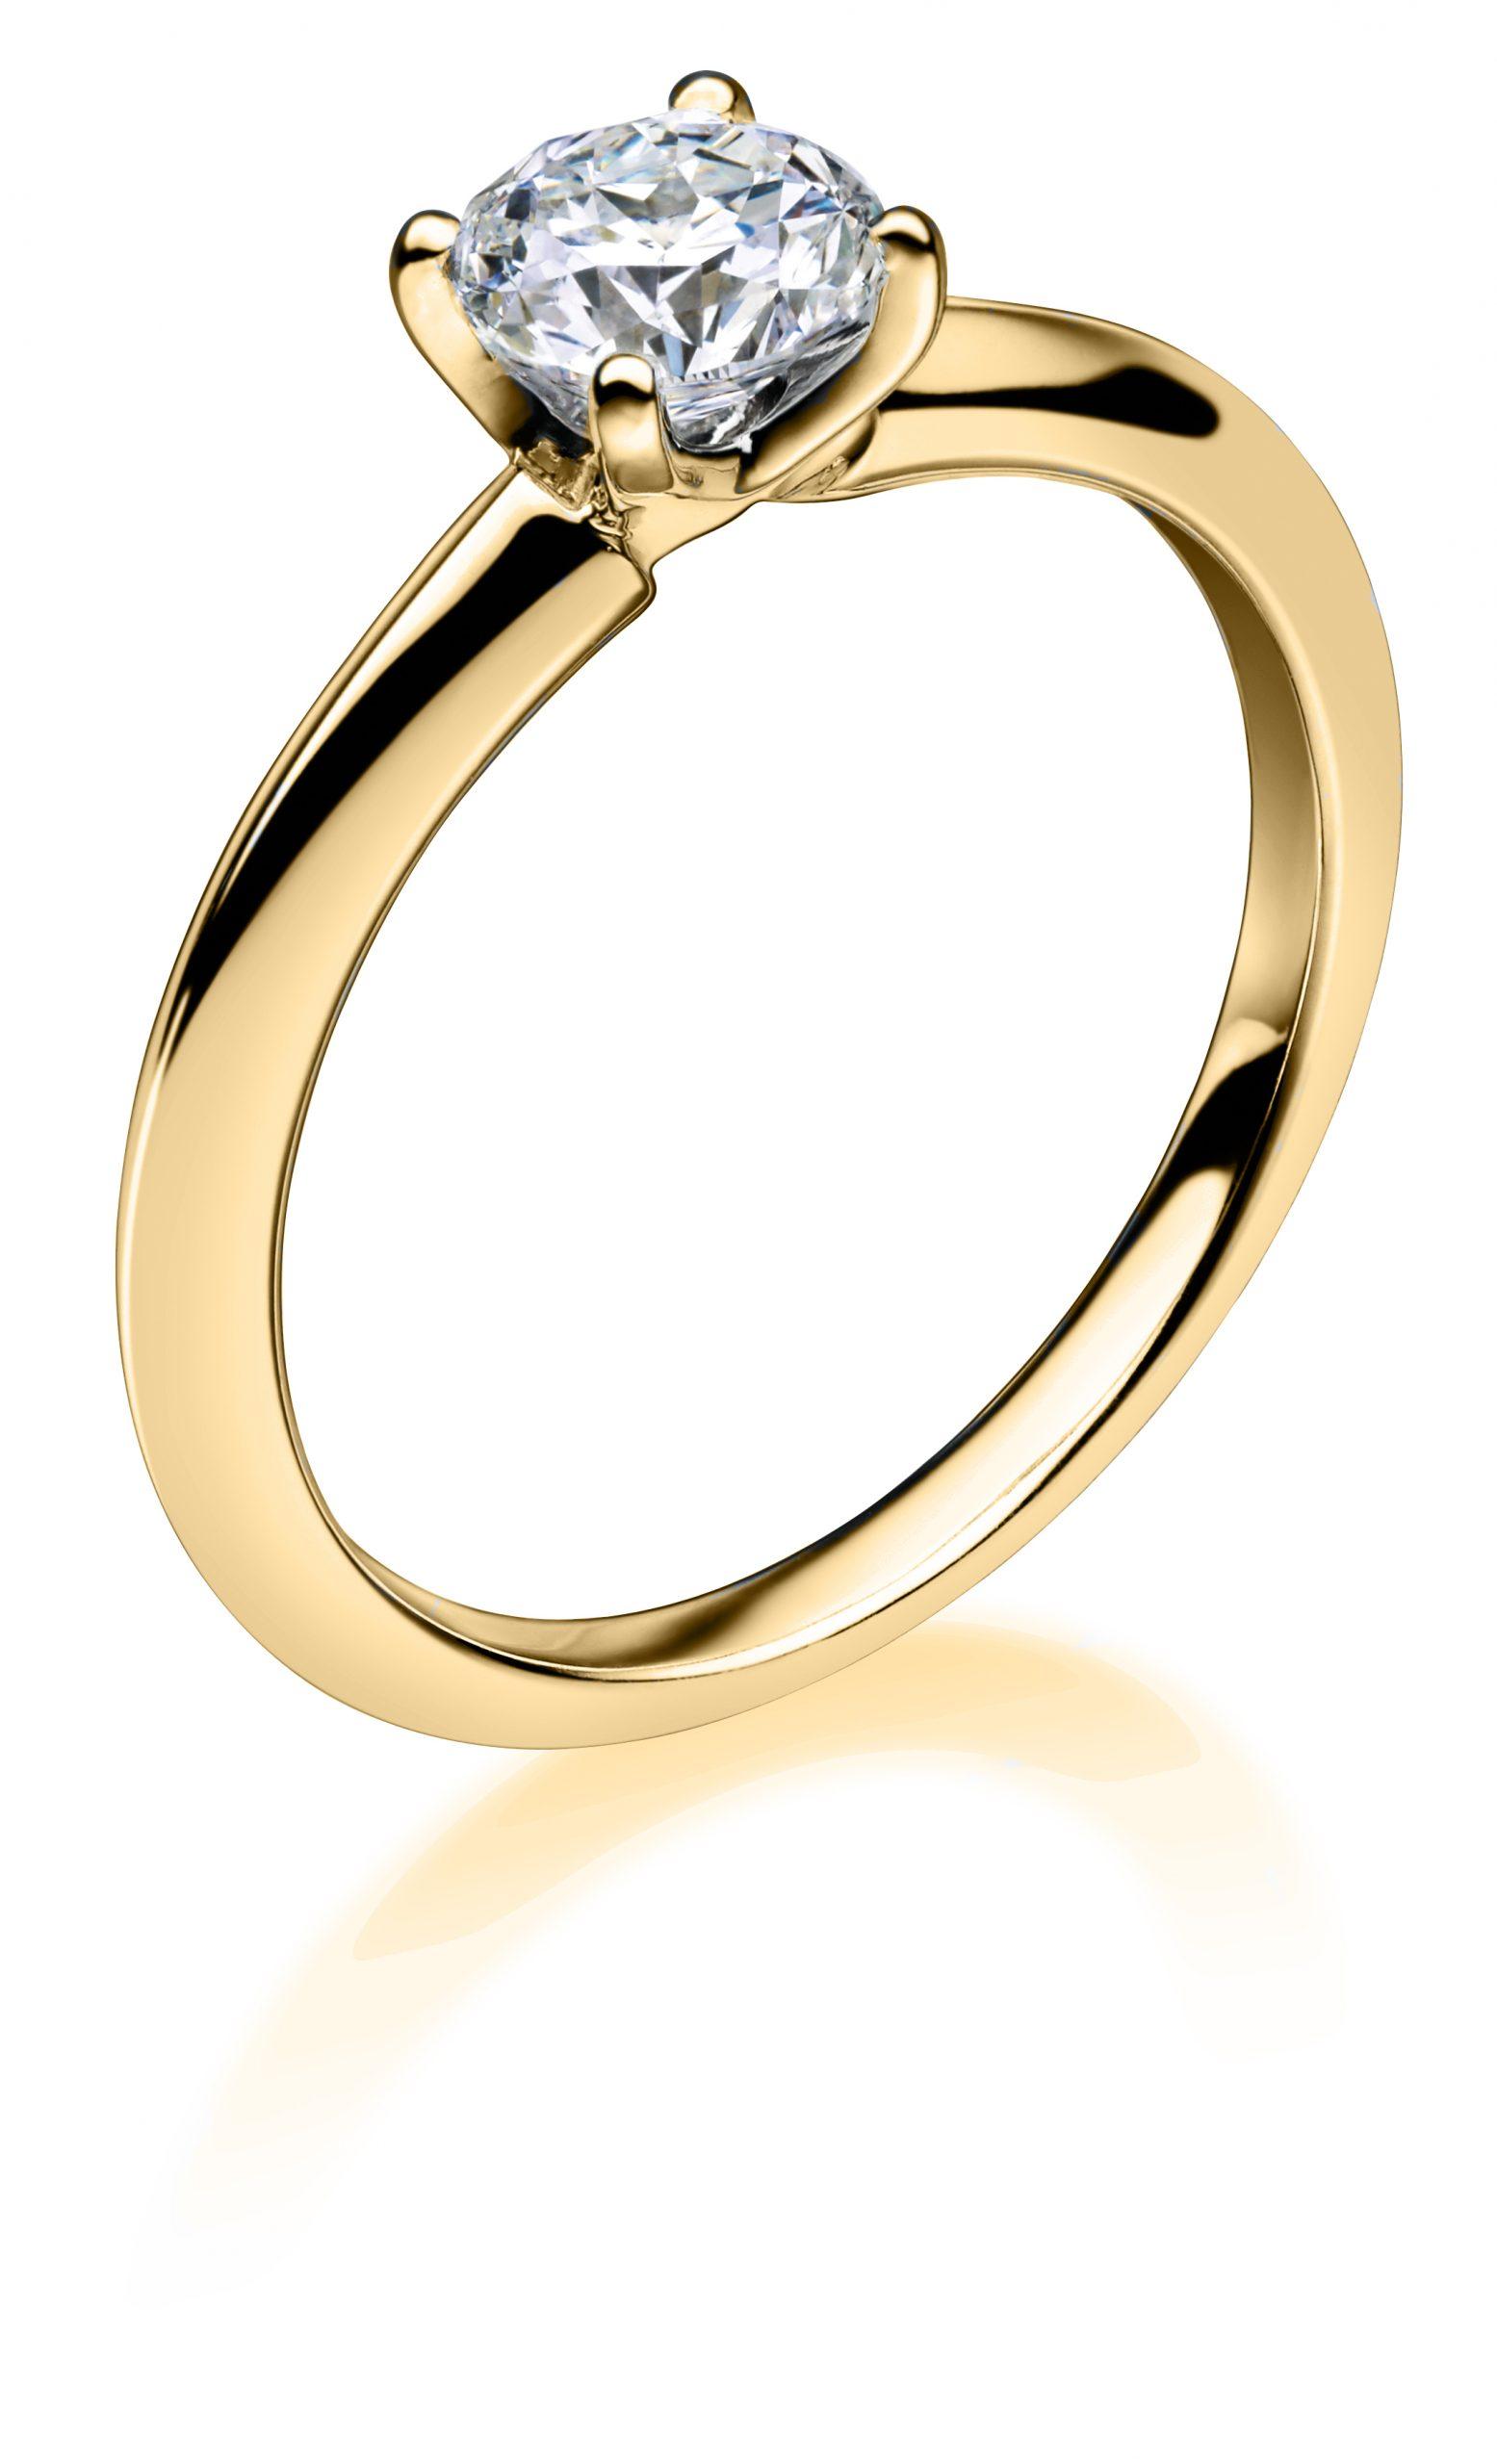 0.55ct Mastercut Diamond 4 Claw Simplicity Ring